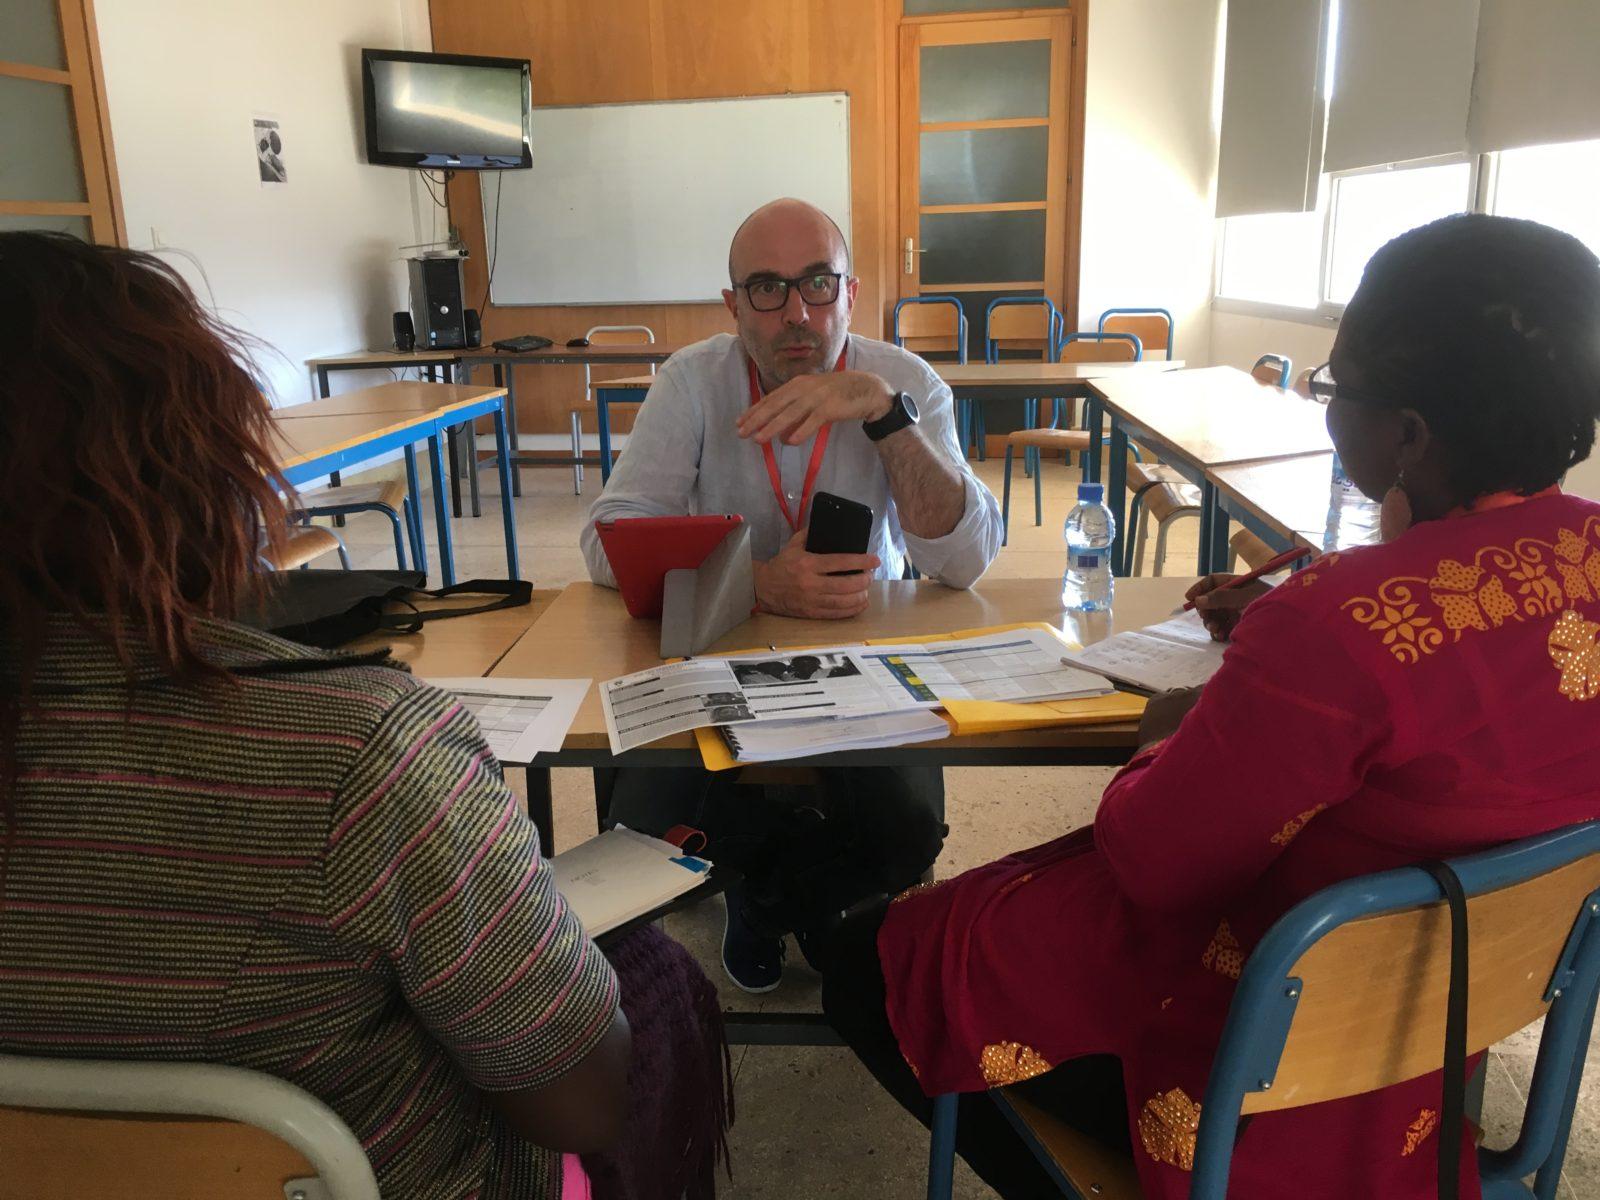 Mamounata Nikiema and Delphine Yerbanga (SUR LES TRACES DU PERE) talking with Denis Vaslin